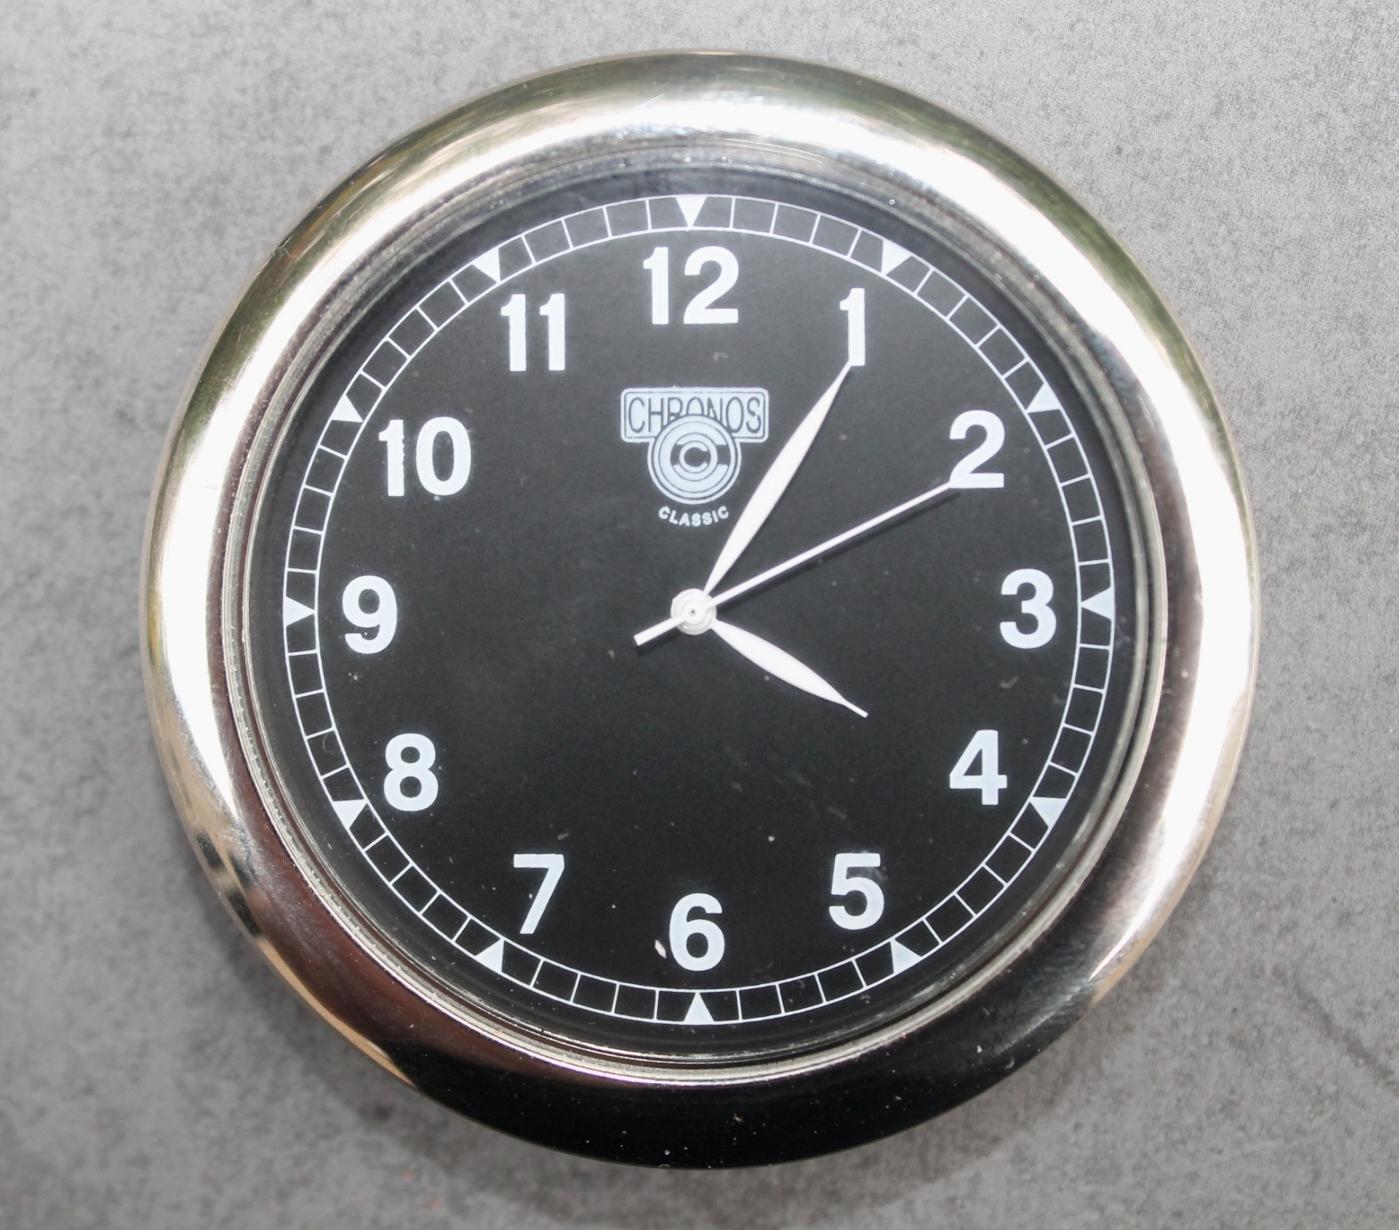 Download free Chronos Clock last version - bestzfil